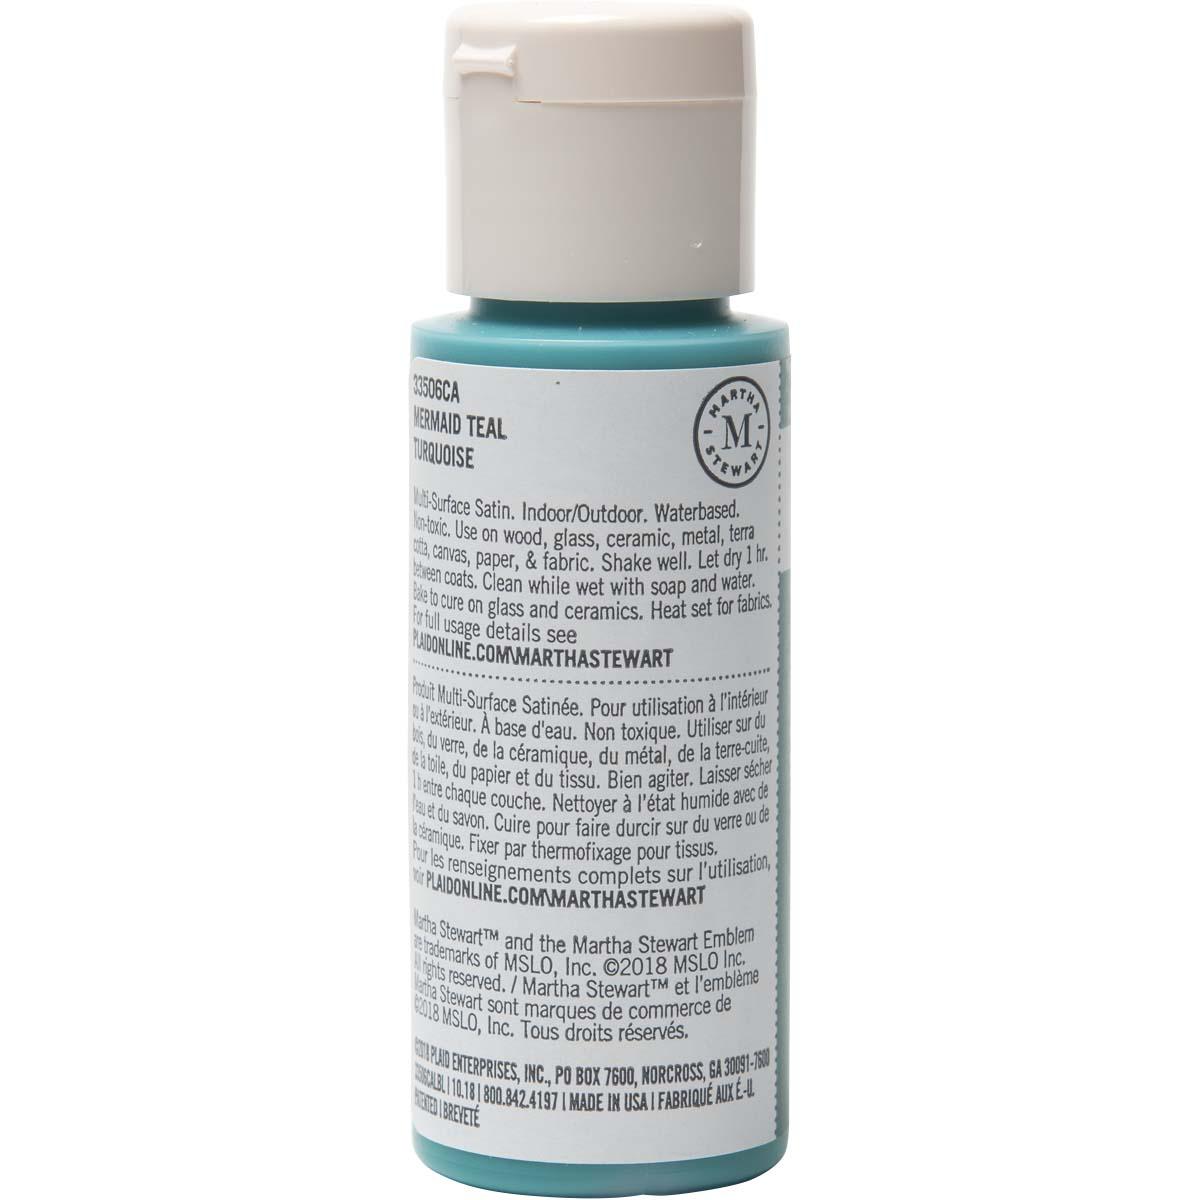 Martha Stewart ® Multi-Surface Satin Acrylic Craft Paint - Mermaid Teal, 2 oz. - 33506CA